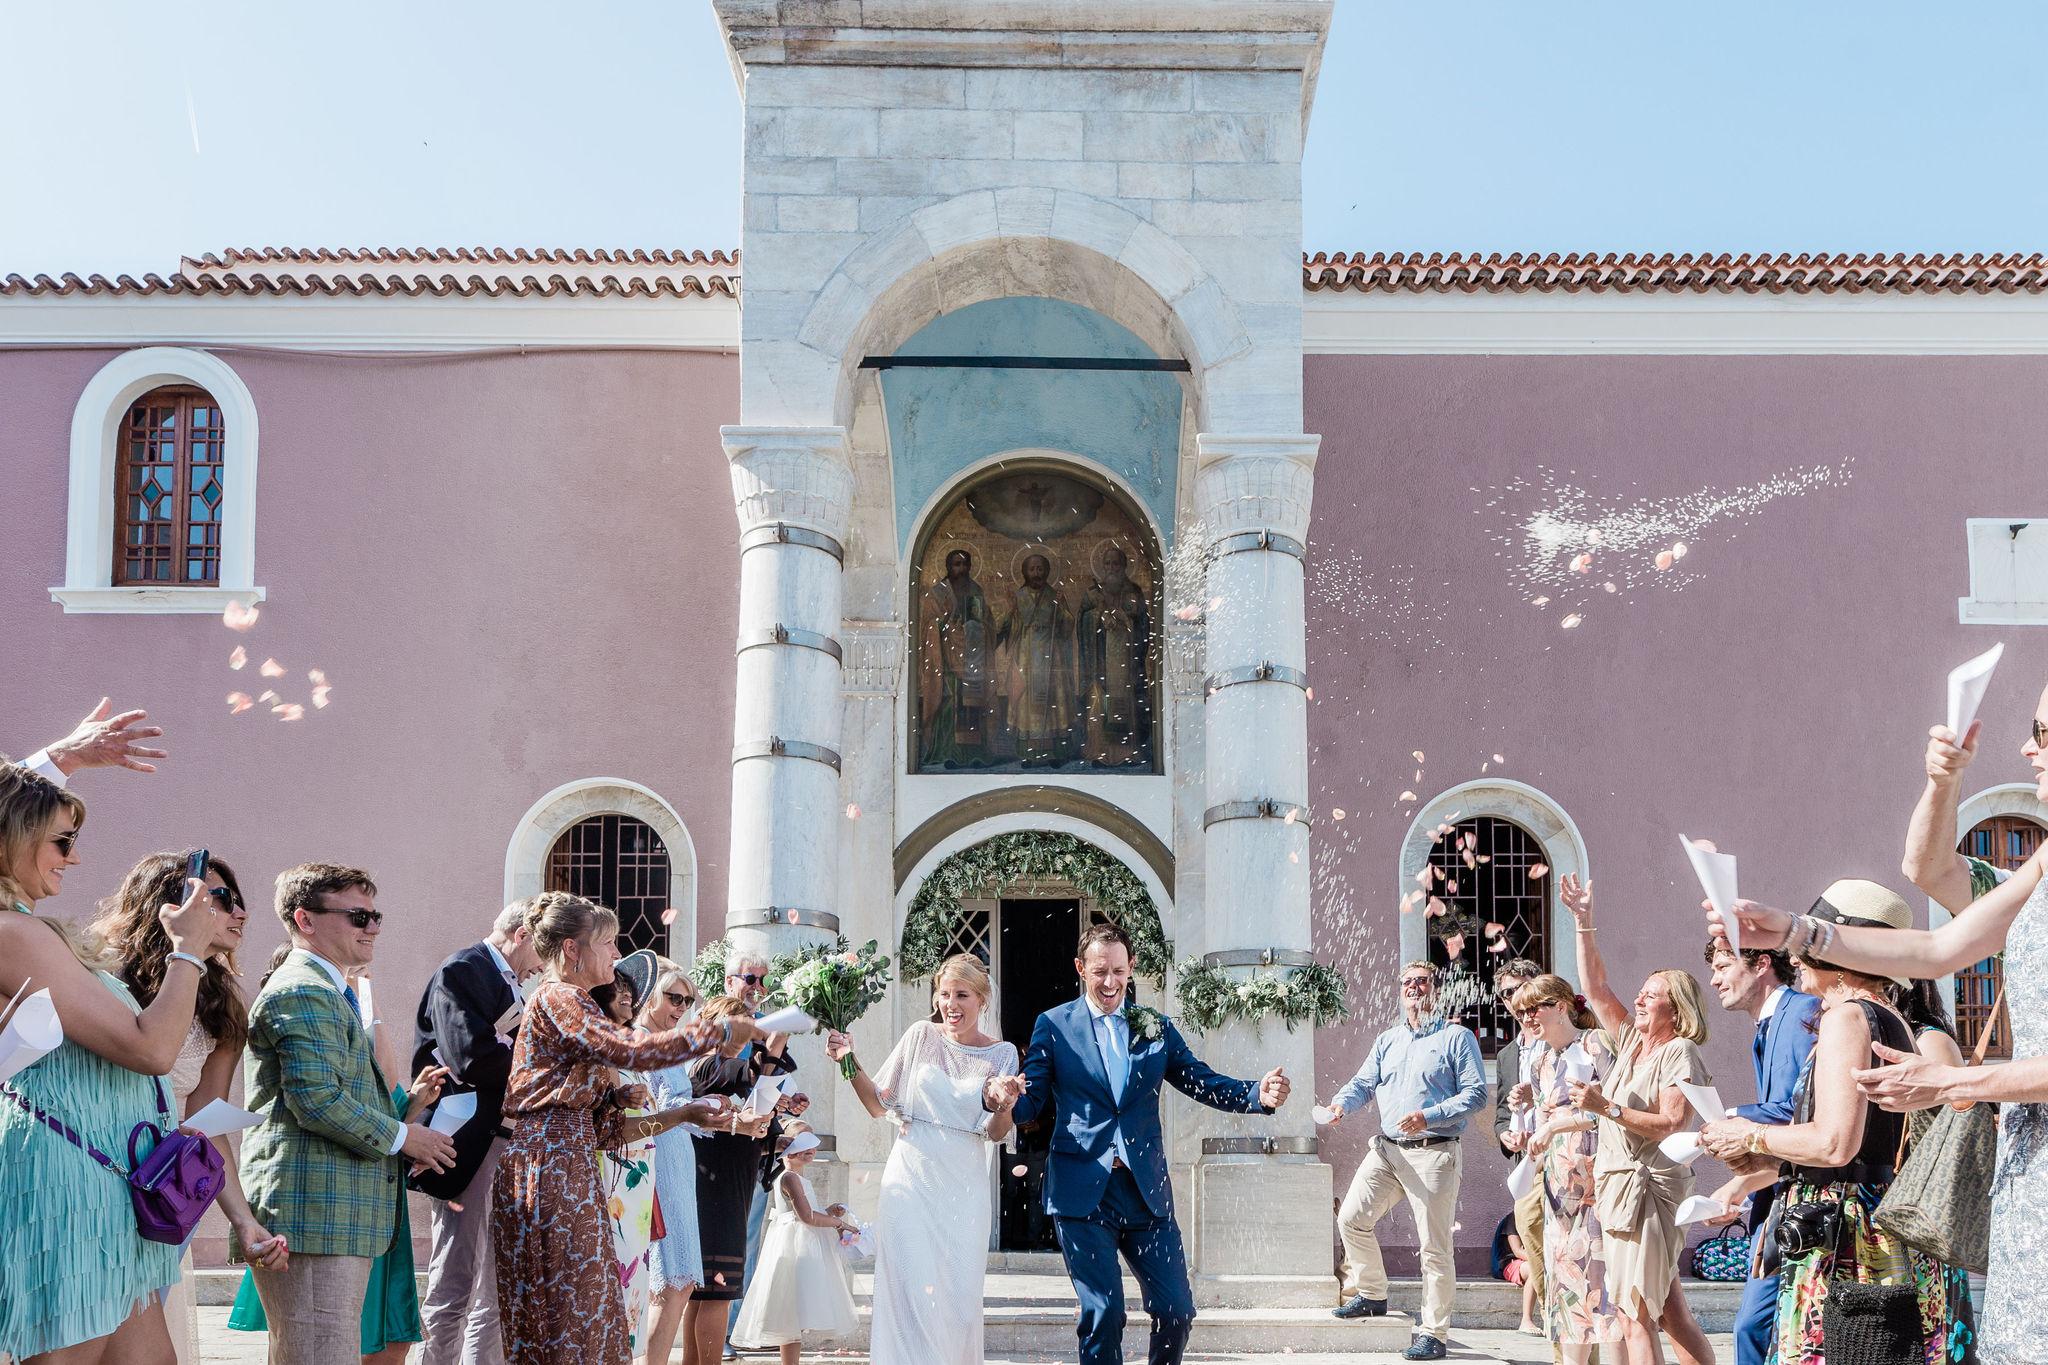 Bruidspaar komt uit hun orthodox Griekse ceremonie gelopen